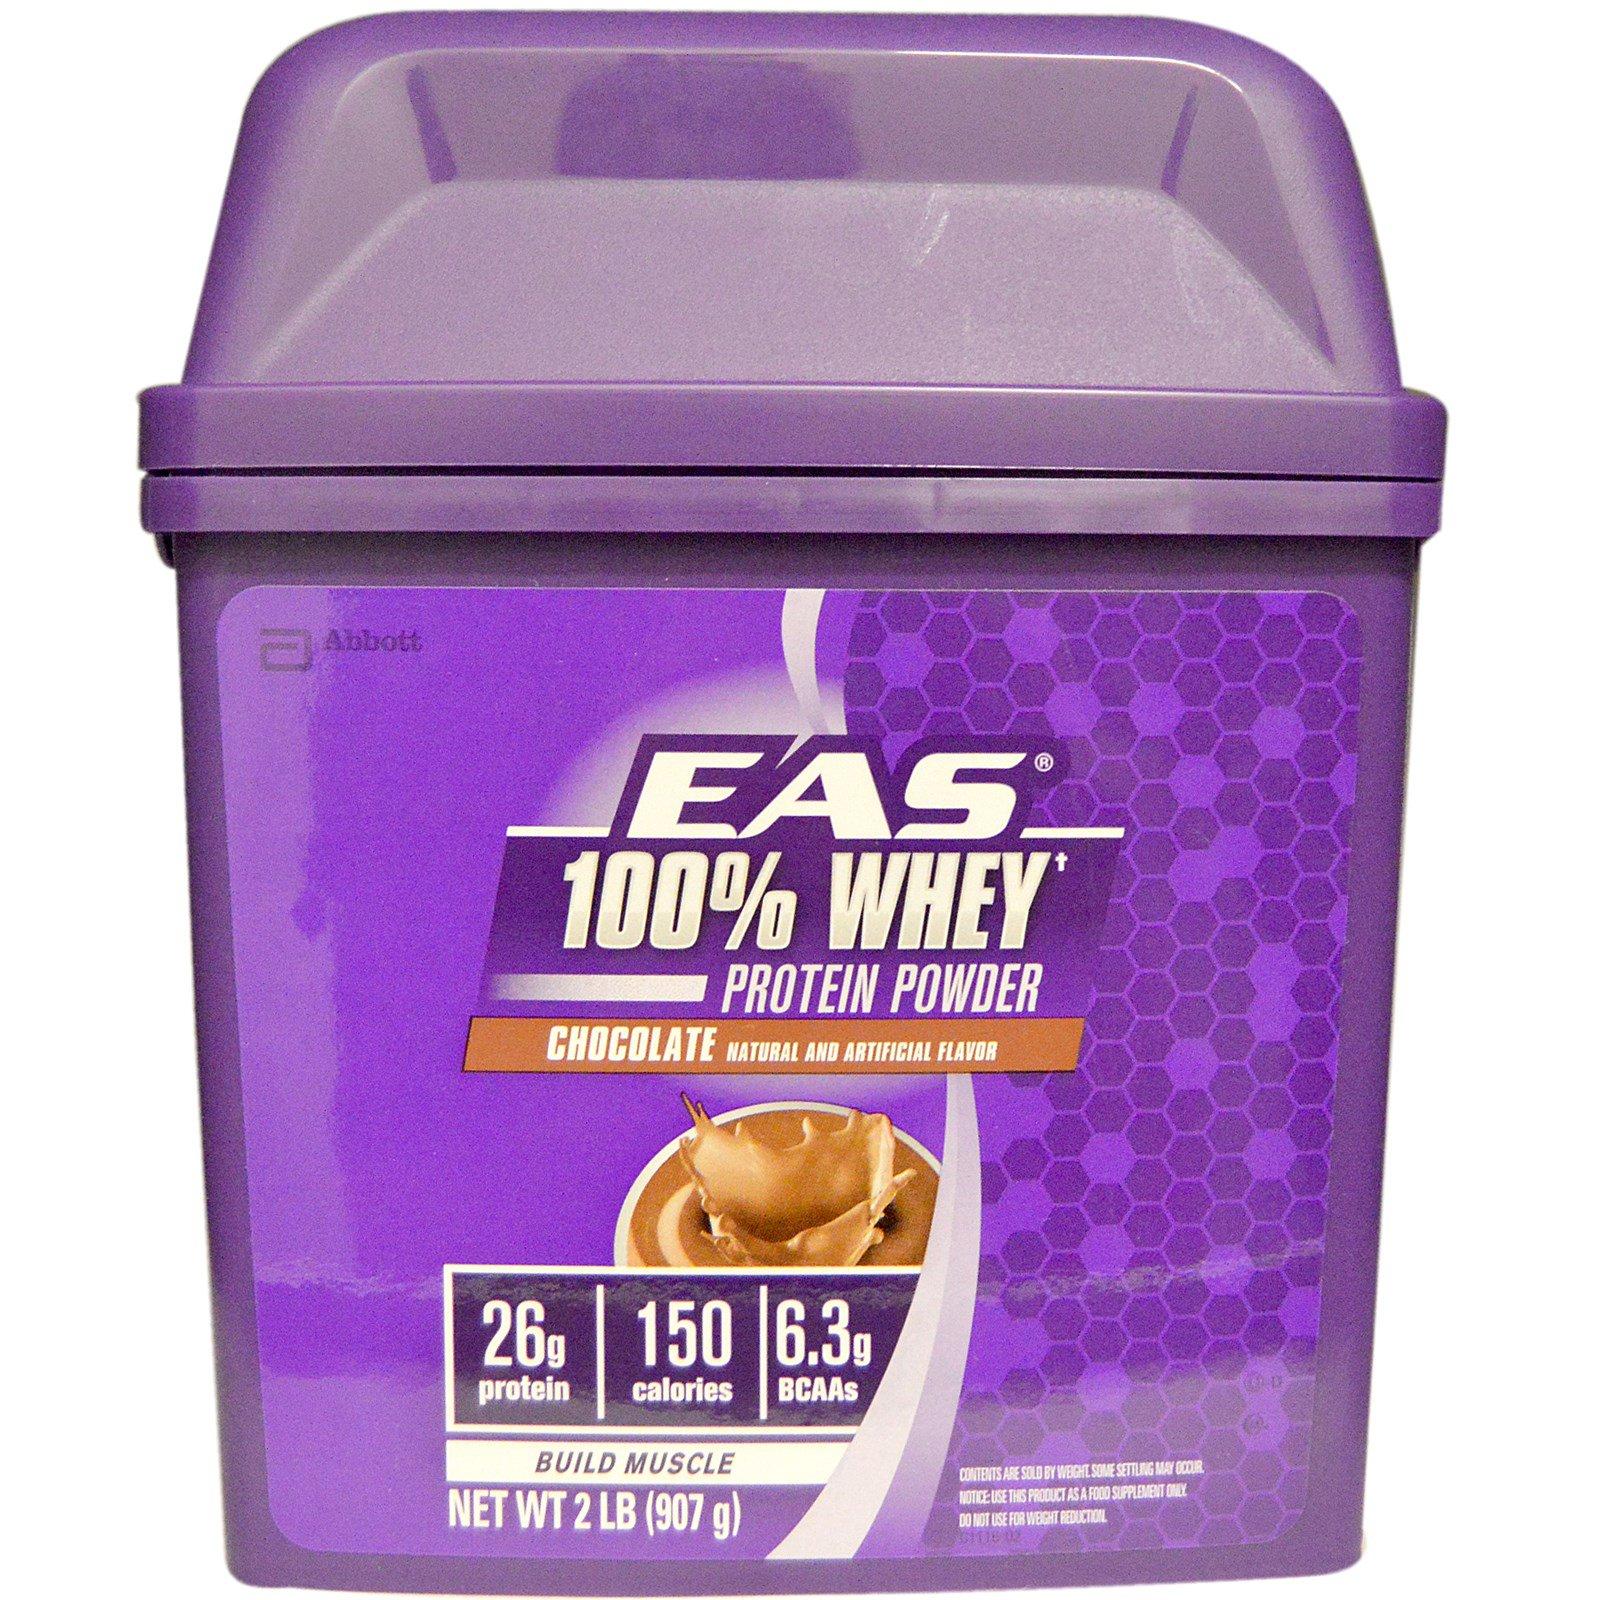 EAS, 100% белок молочной сыворотки, Шоколад, 2 фунта (907 г)